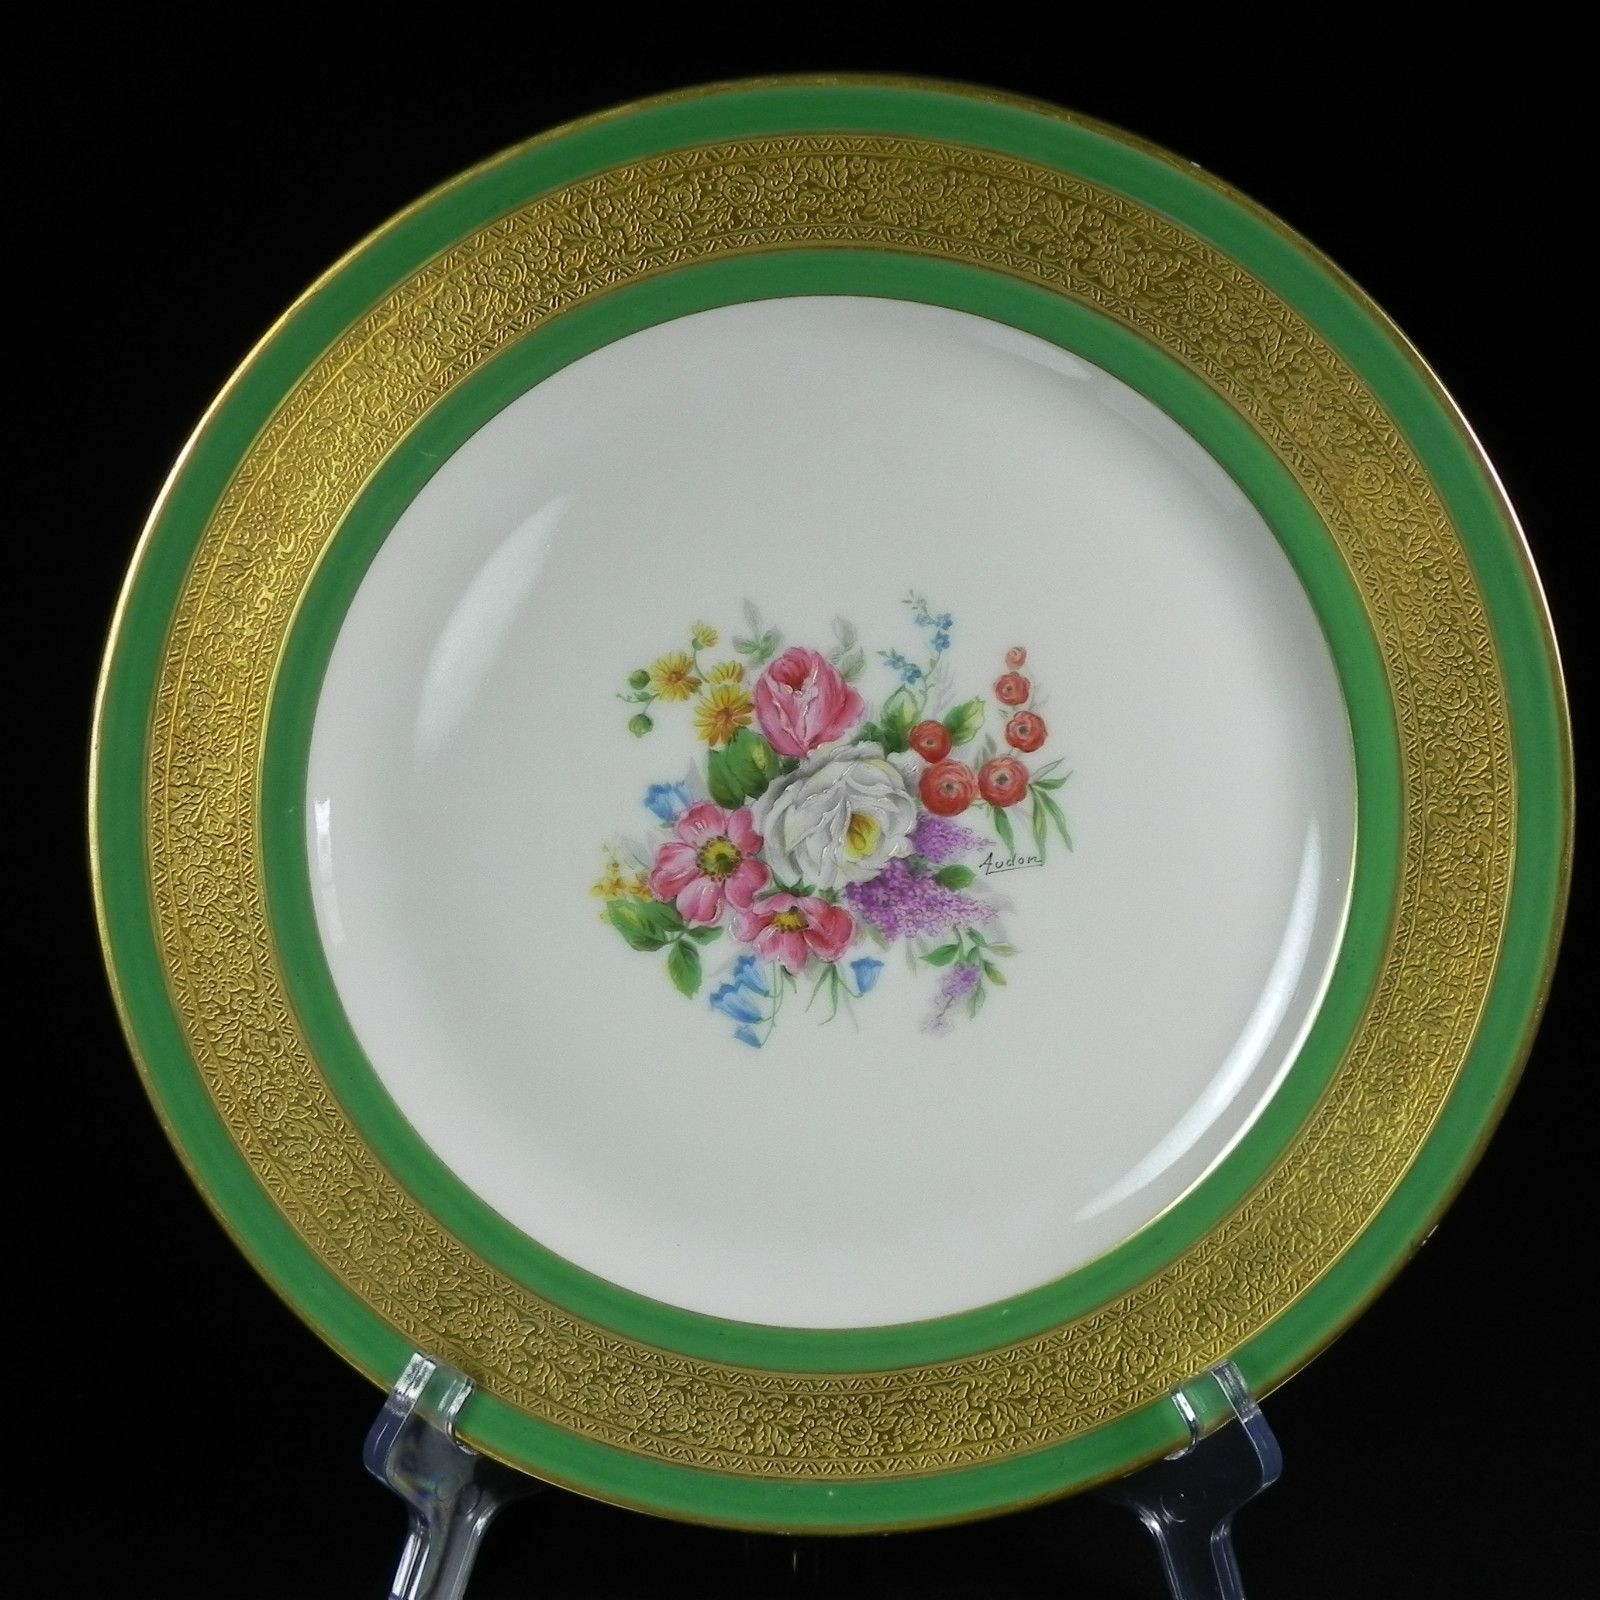 "Audon & Charles Ahrenfeldt,  Limoges Porcelain (France) - Dinner Plate. Emerald Floral. Gold Gilt, D:10 3/8"", 1894-1930   (1600x1600)"